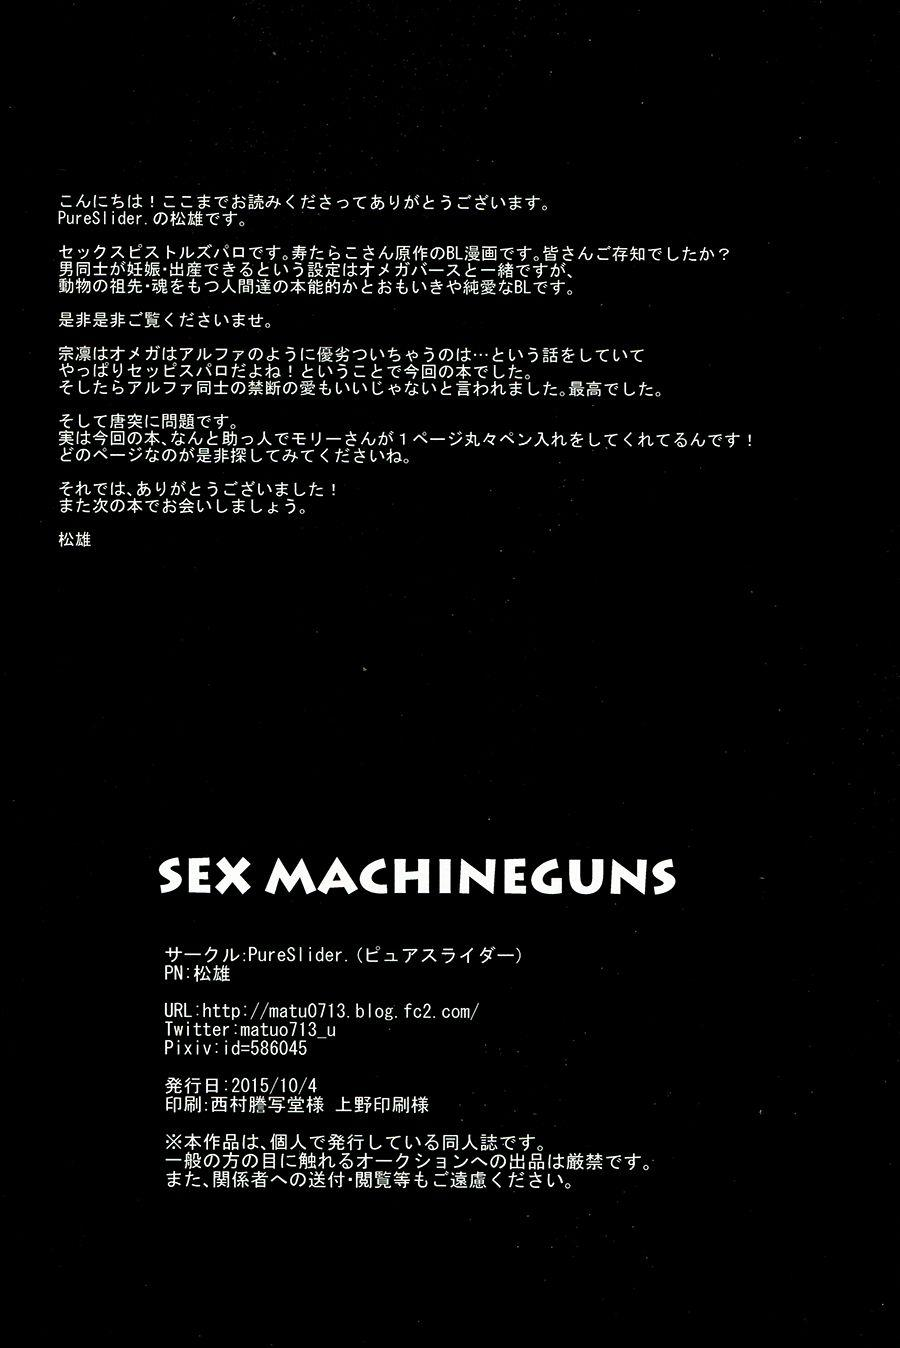 SEX MACHINEGUNS 36